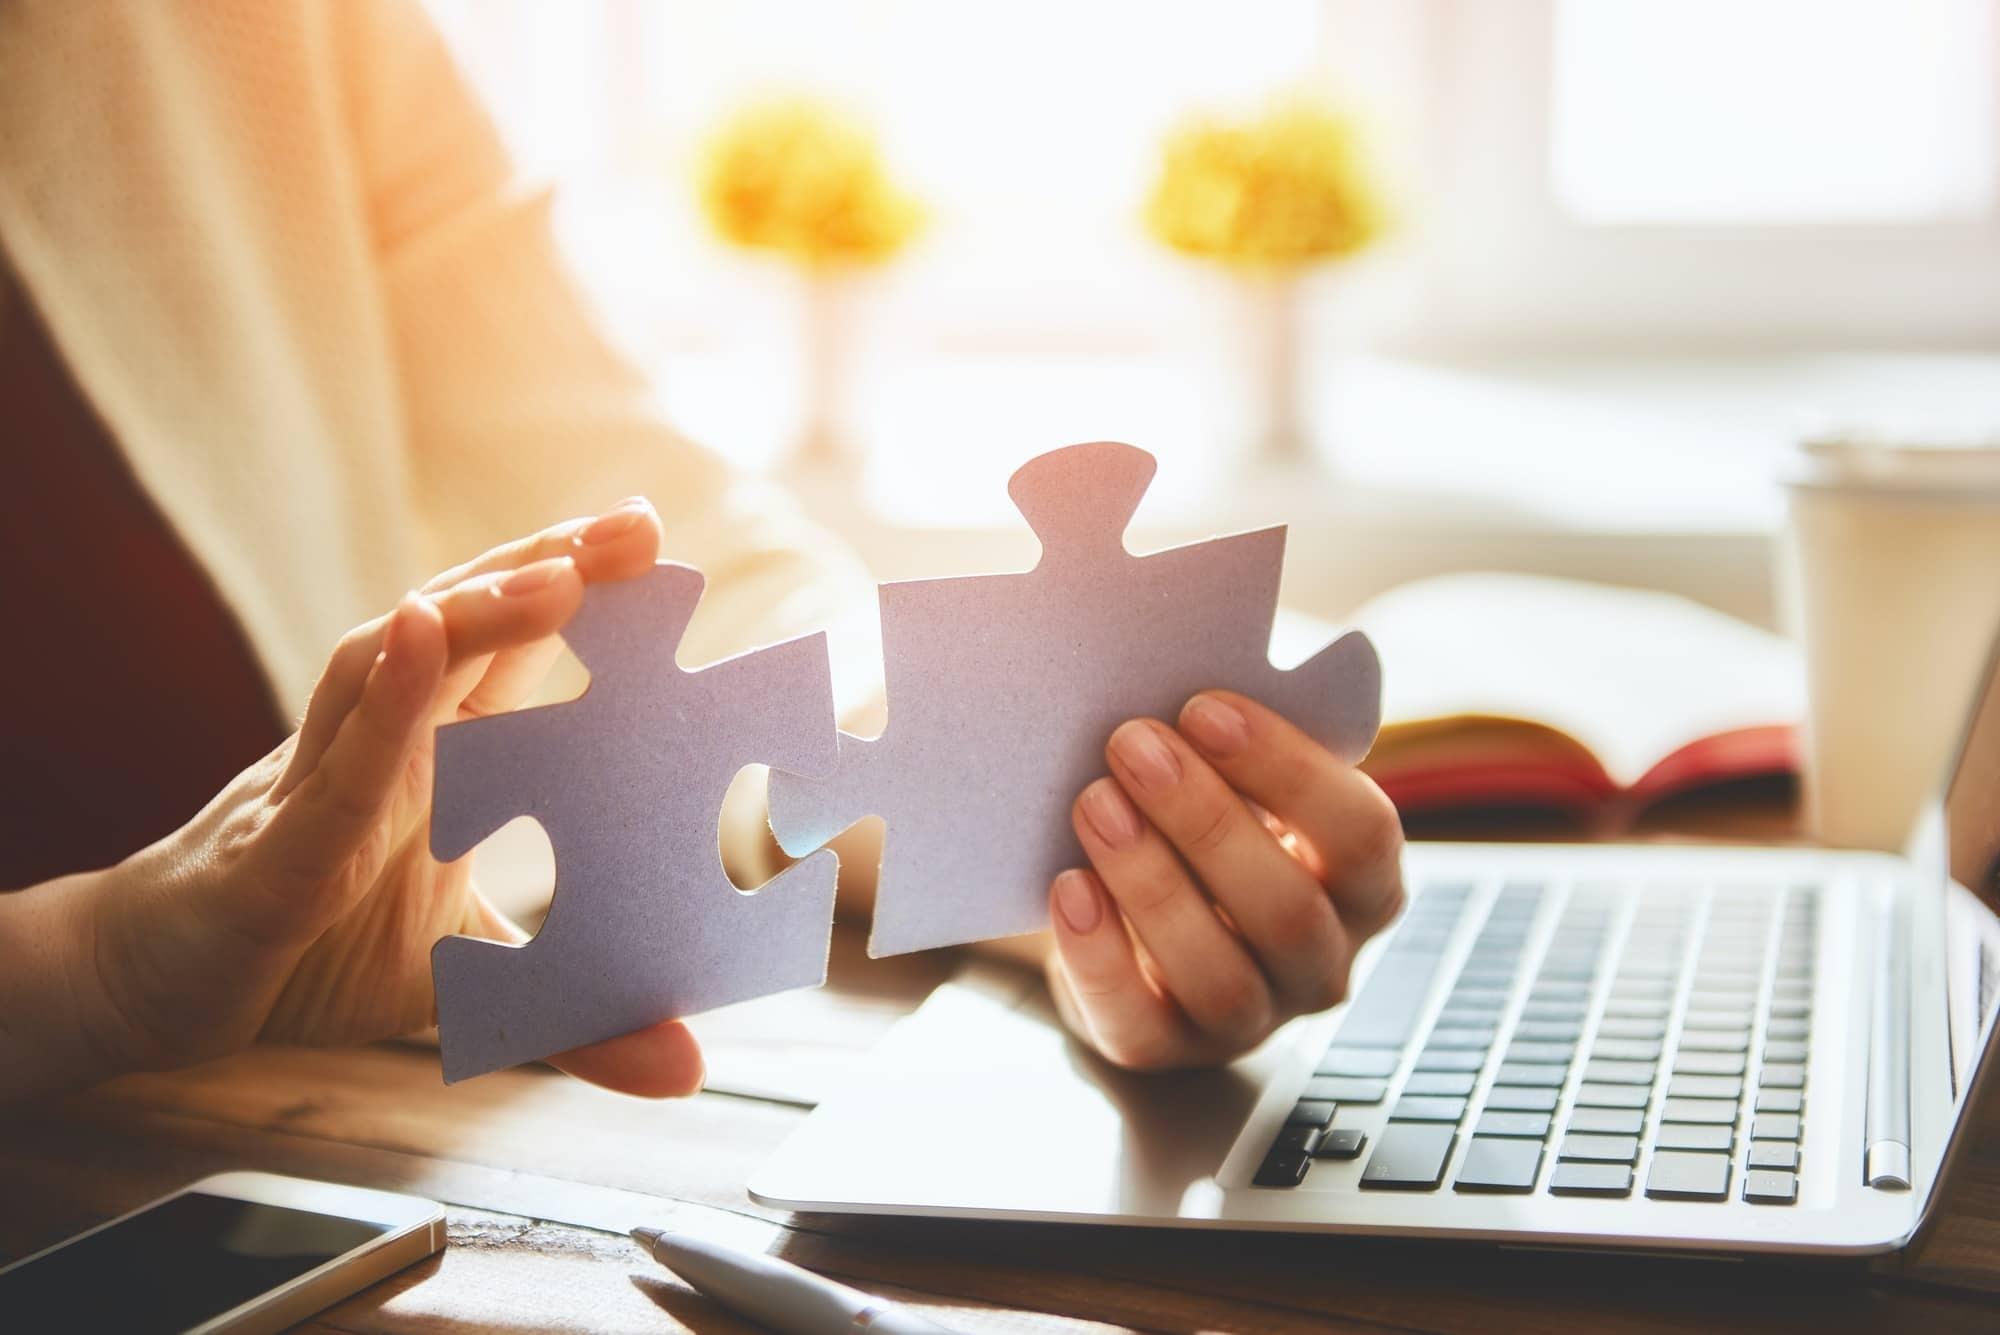 Woman connects couple puzzle piece